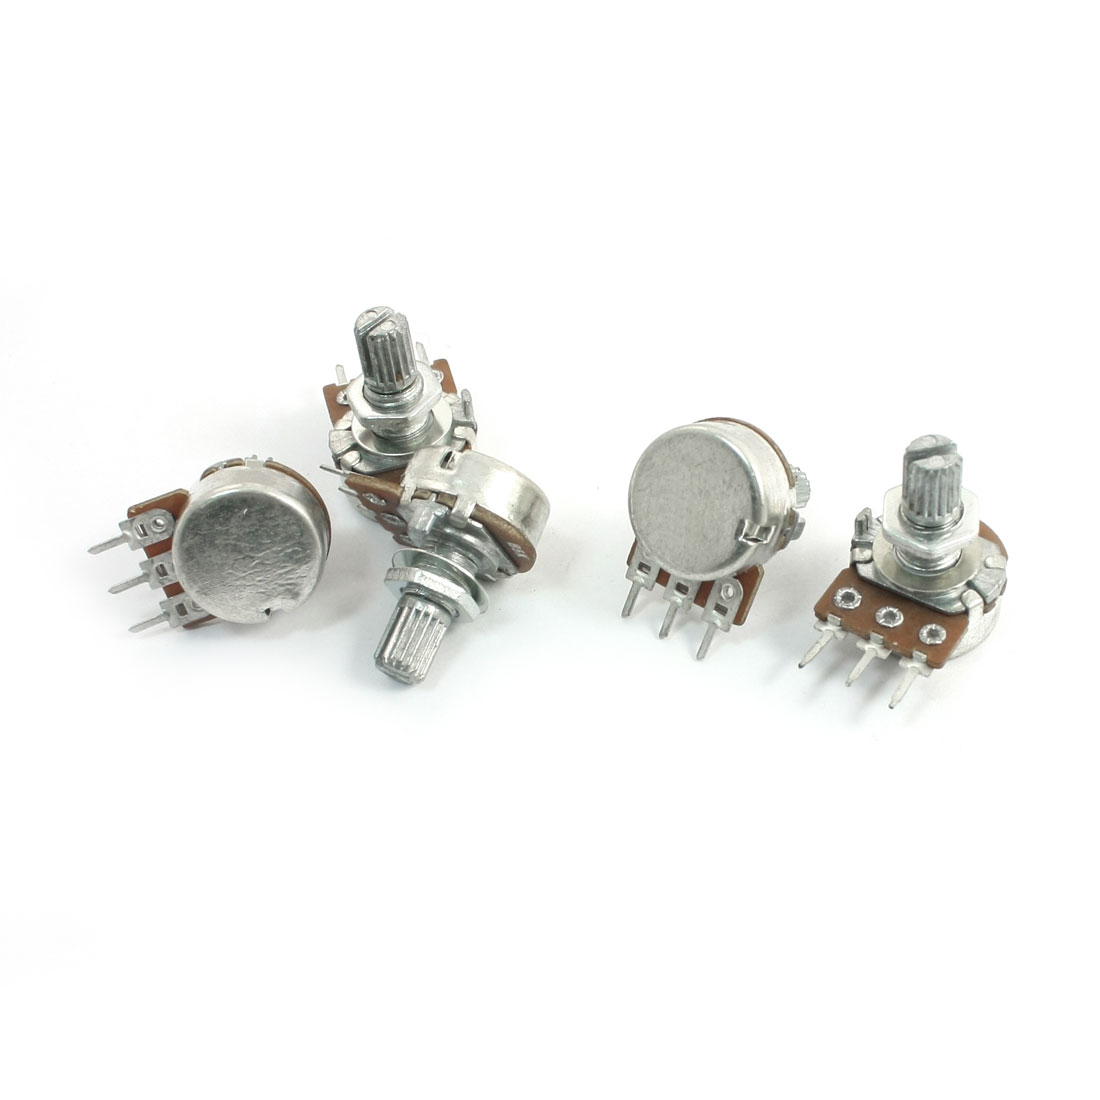 5Pcs B5K 3 Terminals Rotary Audio Single Linear Taper Potentiometers